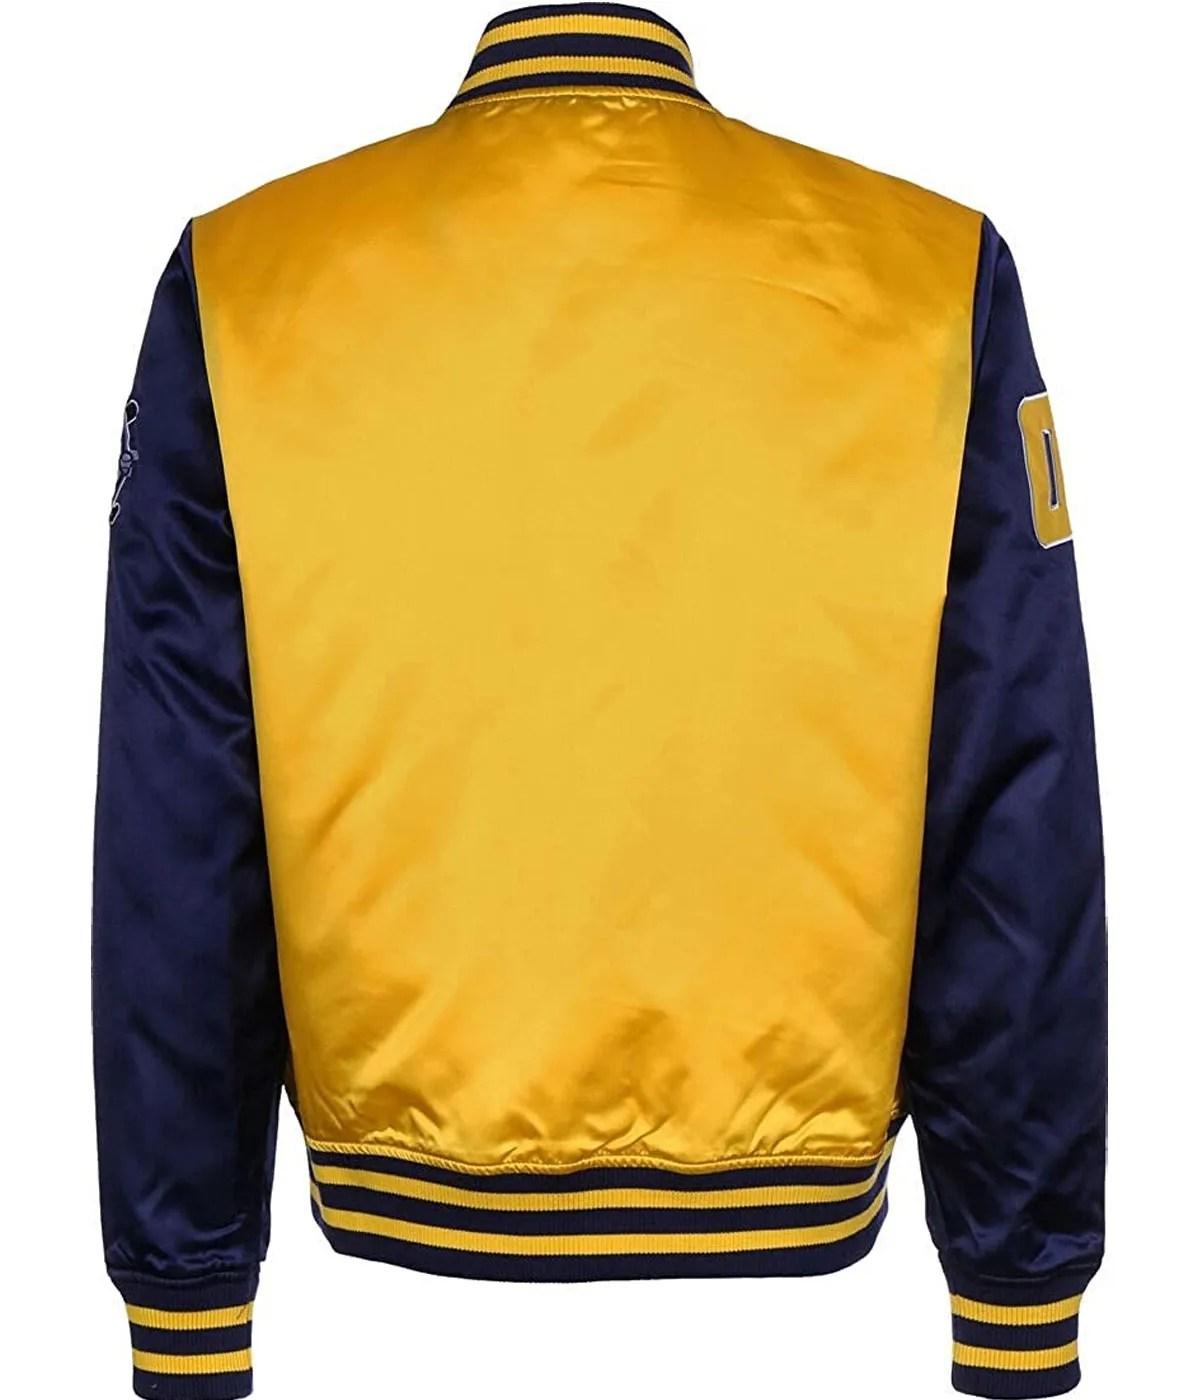 college-fubu-varsity-jacket